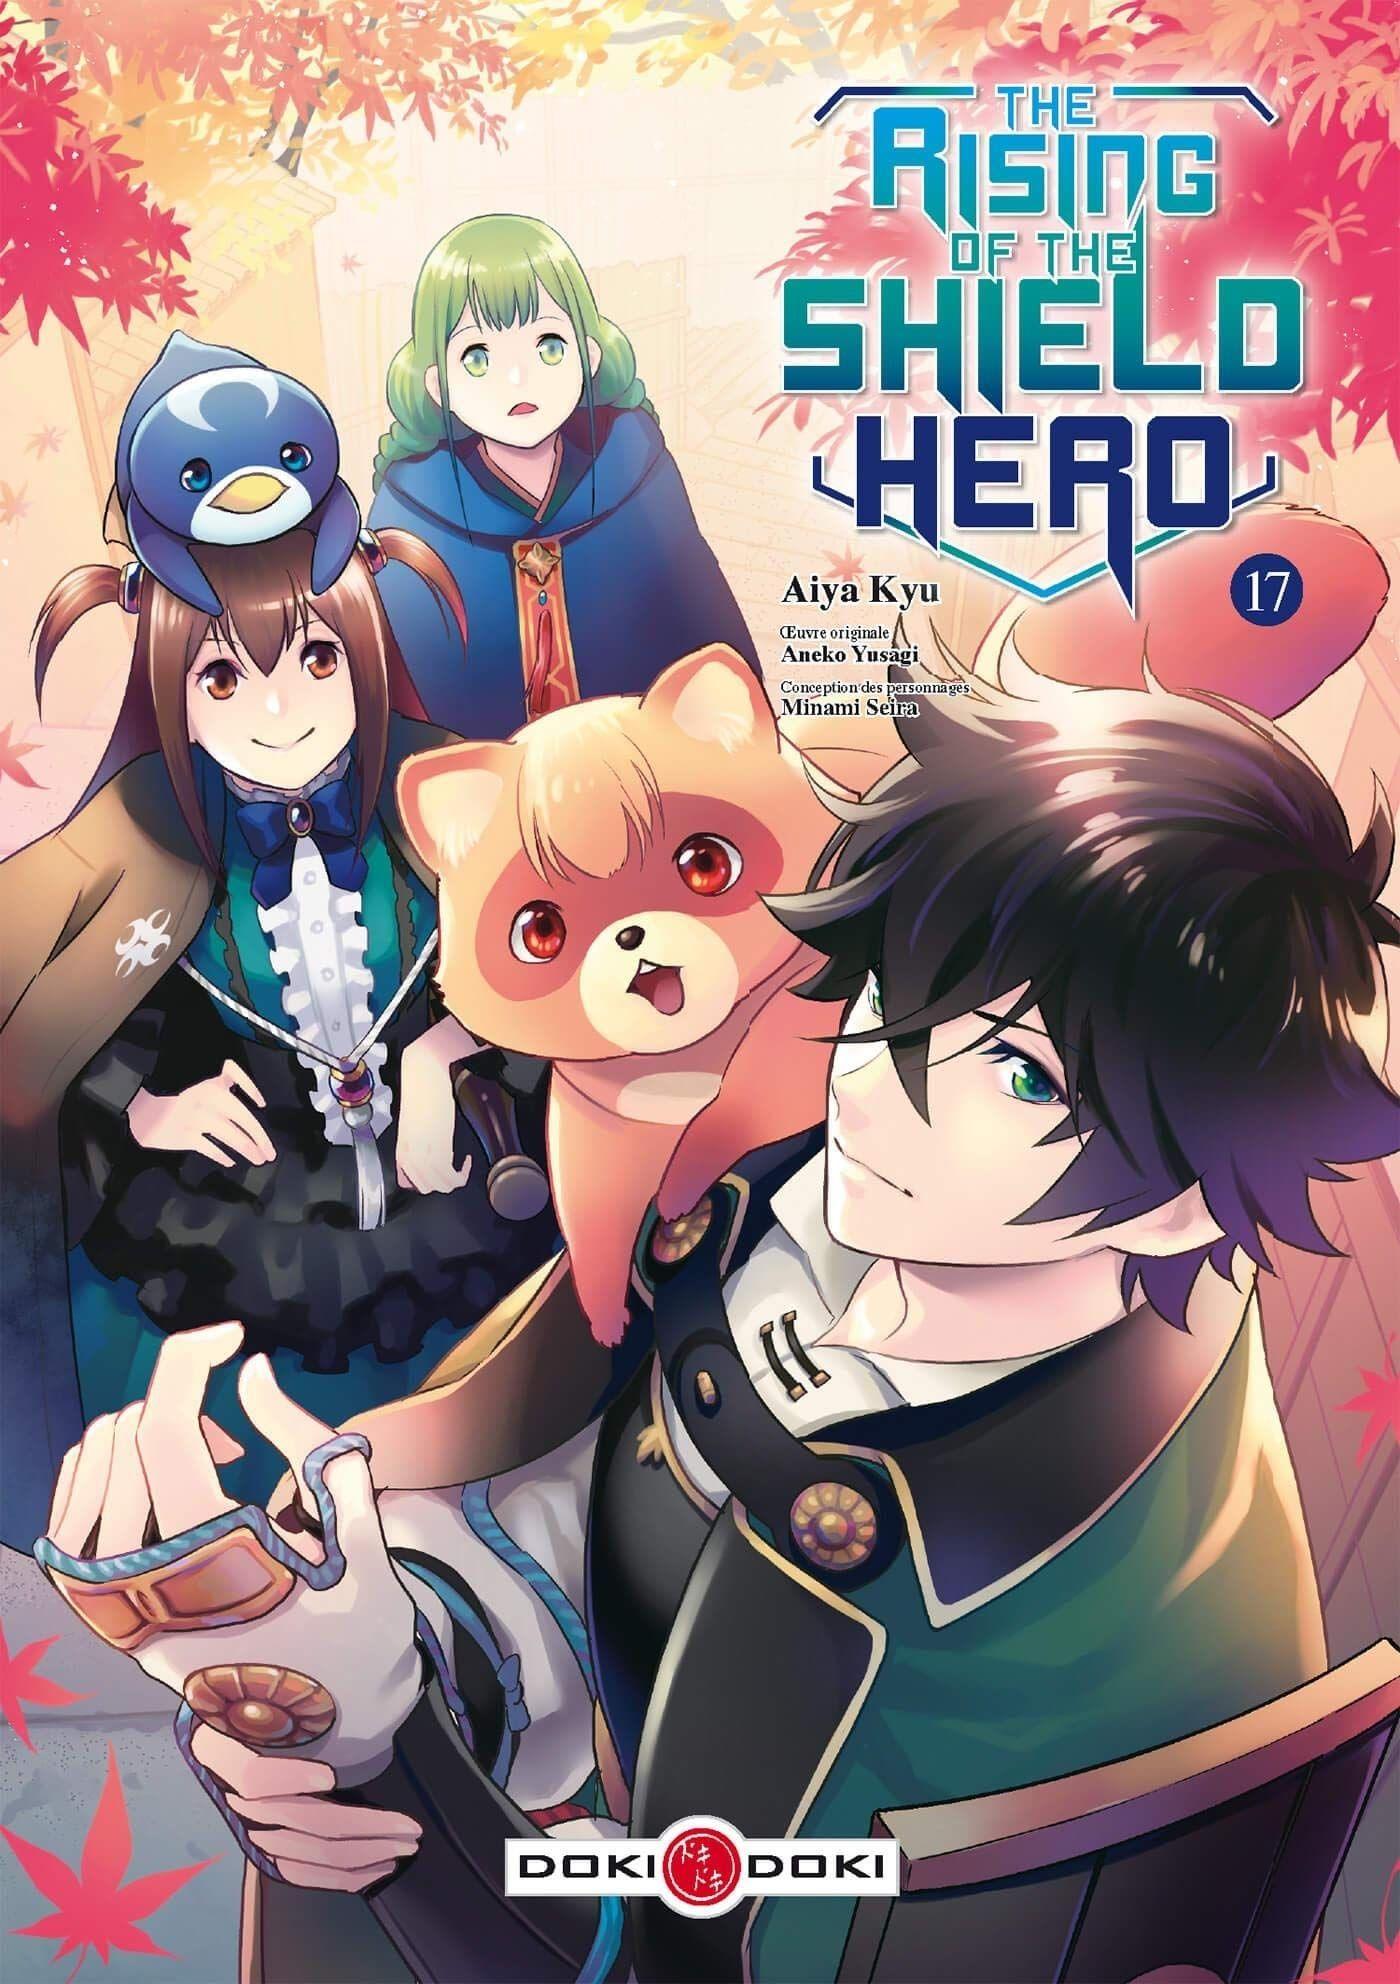 Sortie Manga au Québec JUIN 2021 The_rising_of_the_shield_Hero_17_doki